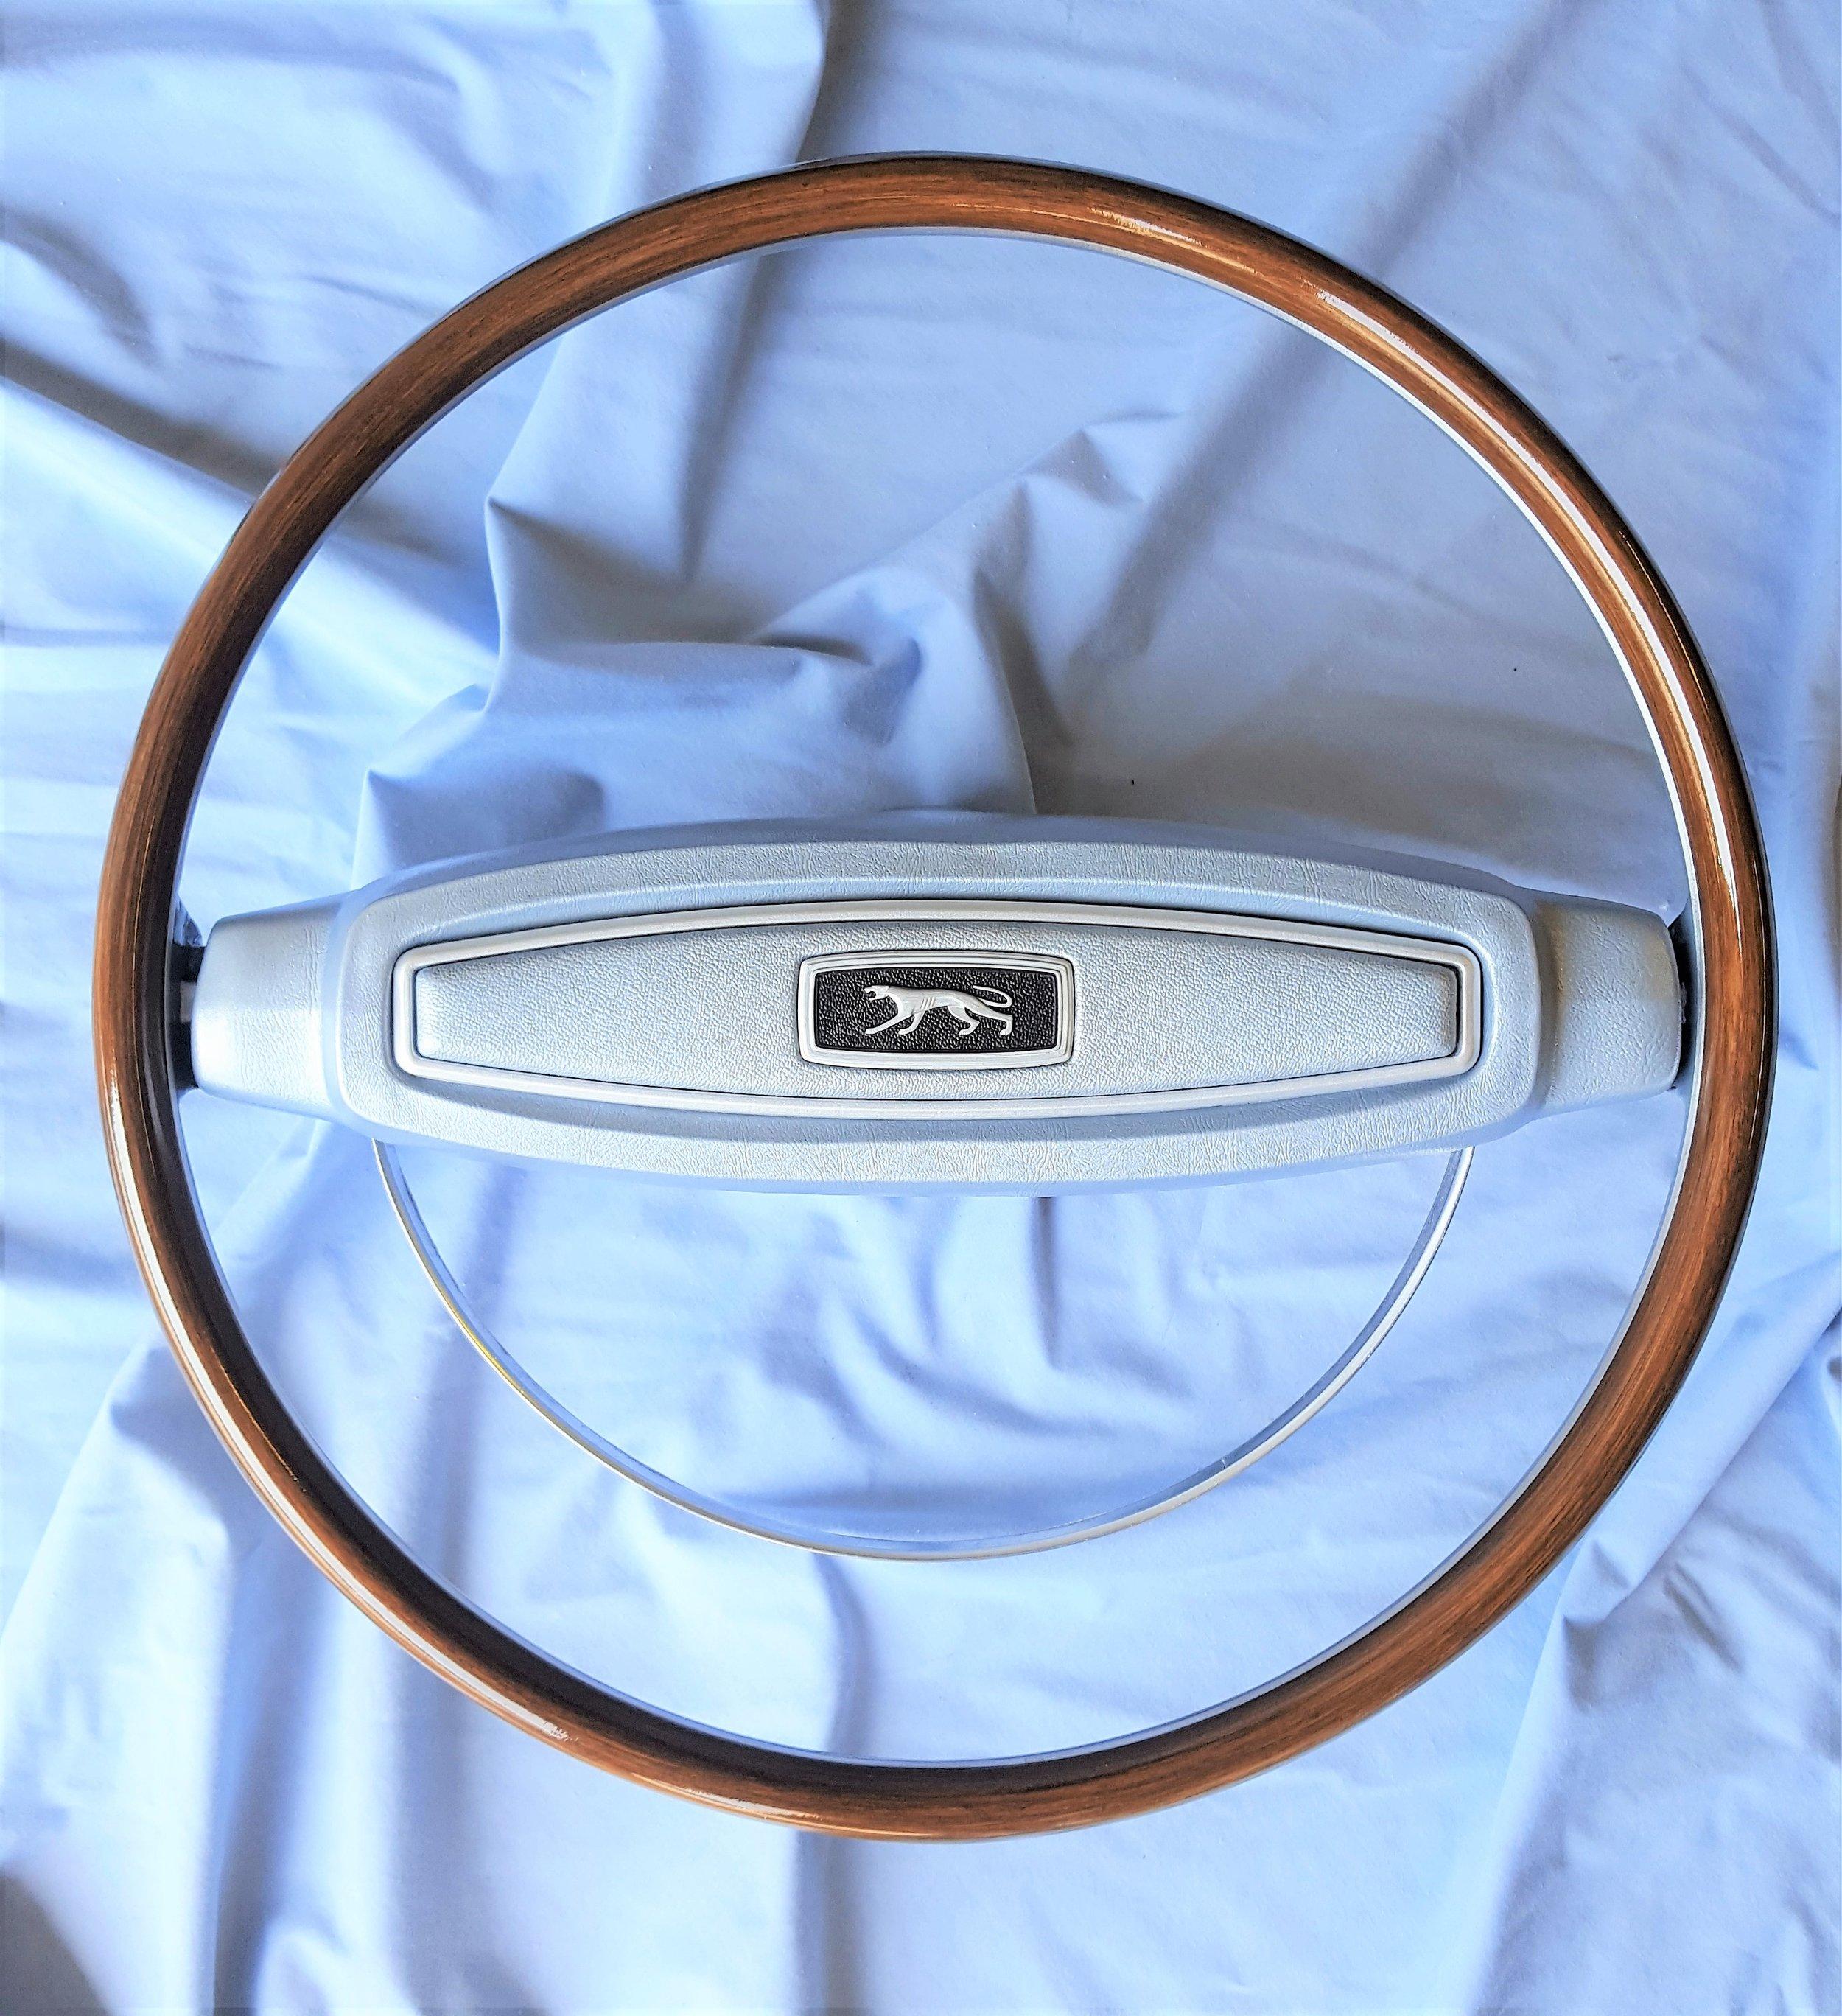 1968 Cougar deluxe steering wheel